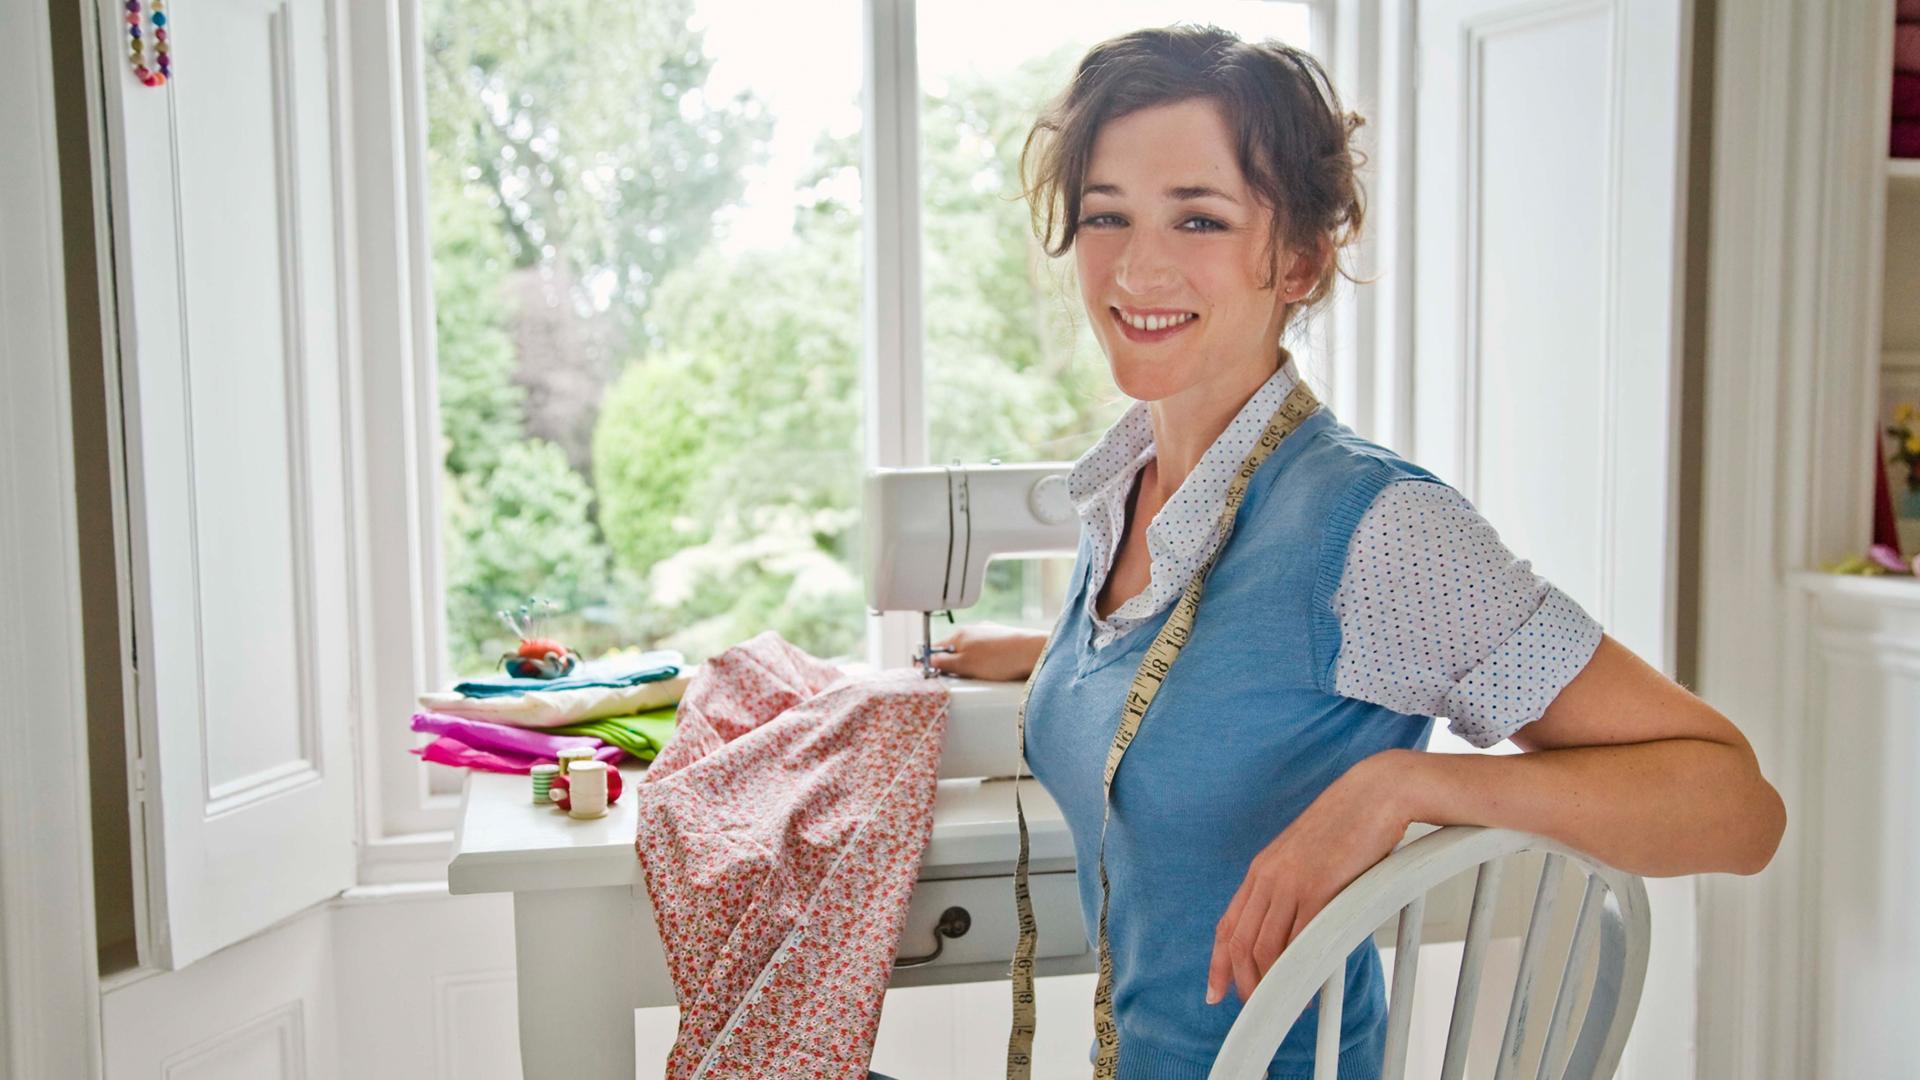 Woman sewing | Sheknows.com